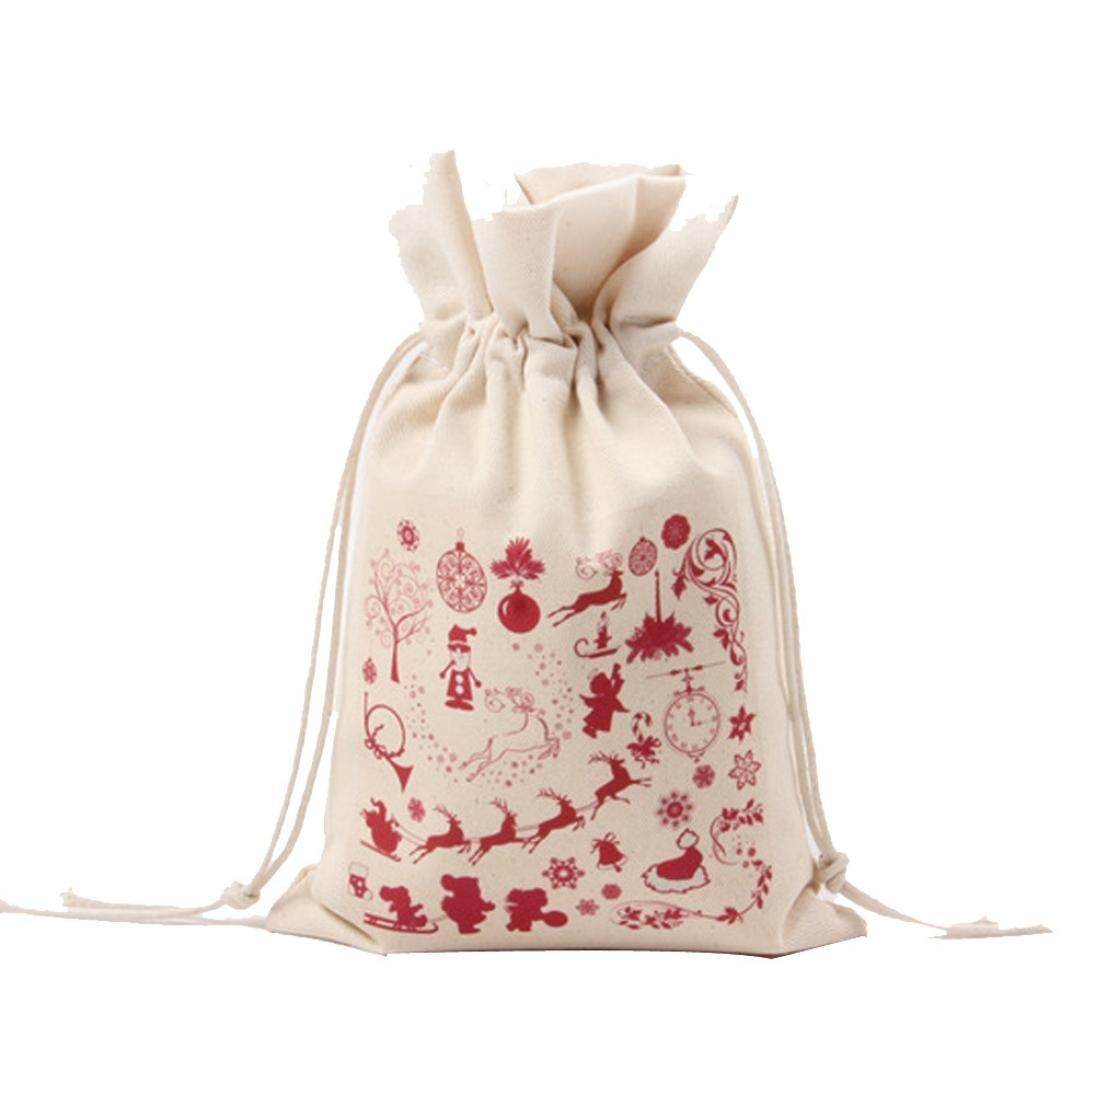 SMILEQ Christmas Small Gift Bag Printing Drawstring Beam Port Storage Candy Bag